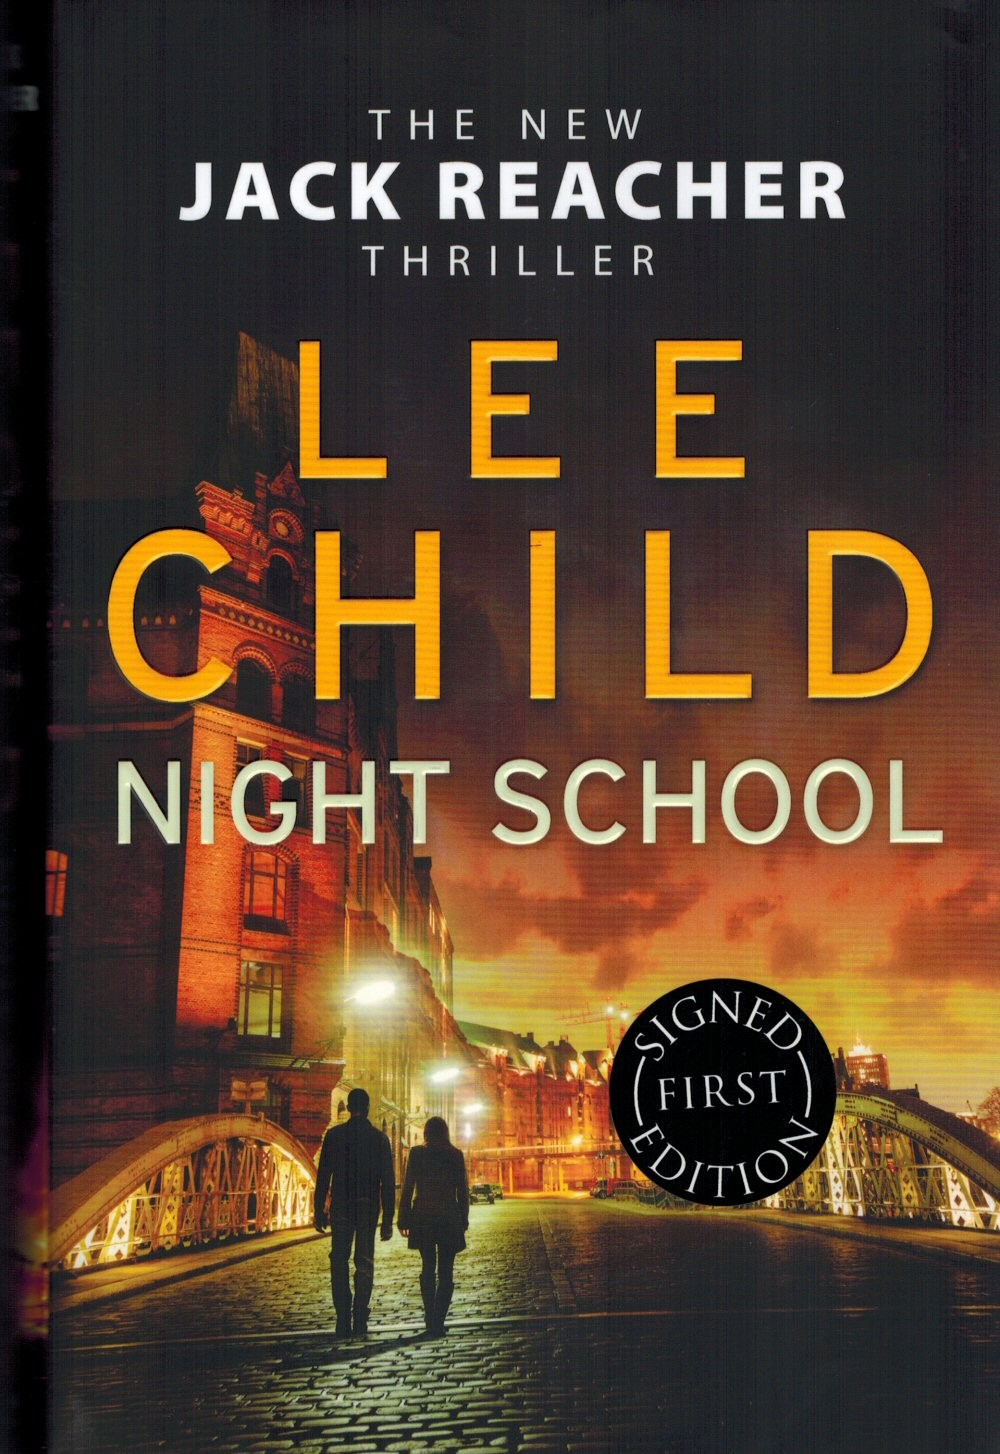 Night SchoolLee ChildRating: 4.5 / 5 - Jack Reacher novel #21Lee ChildRating: 4.5 / 5